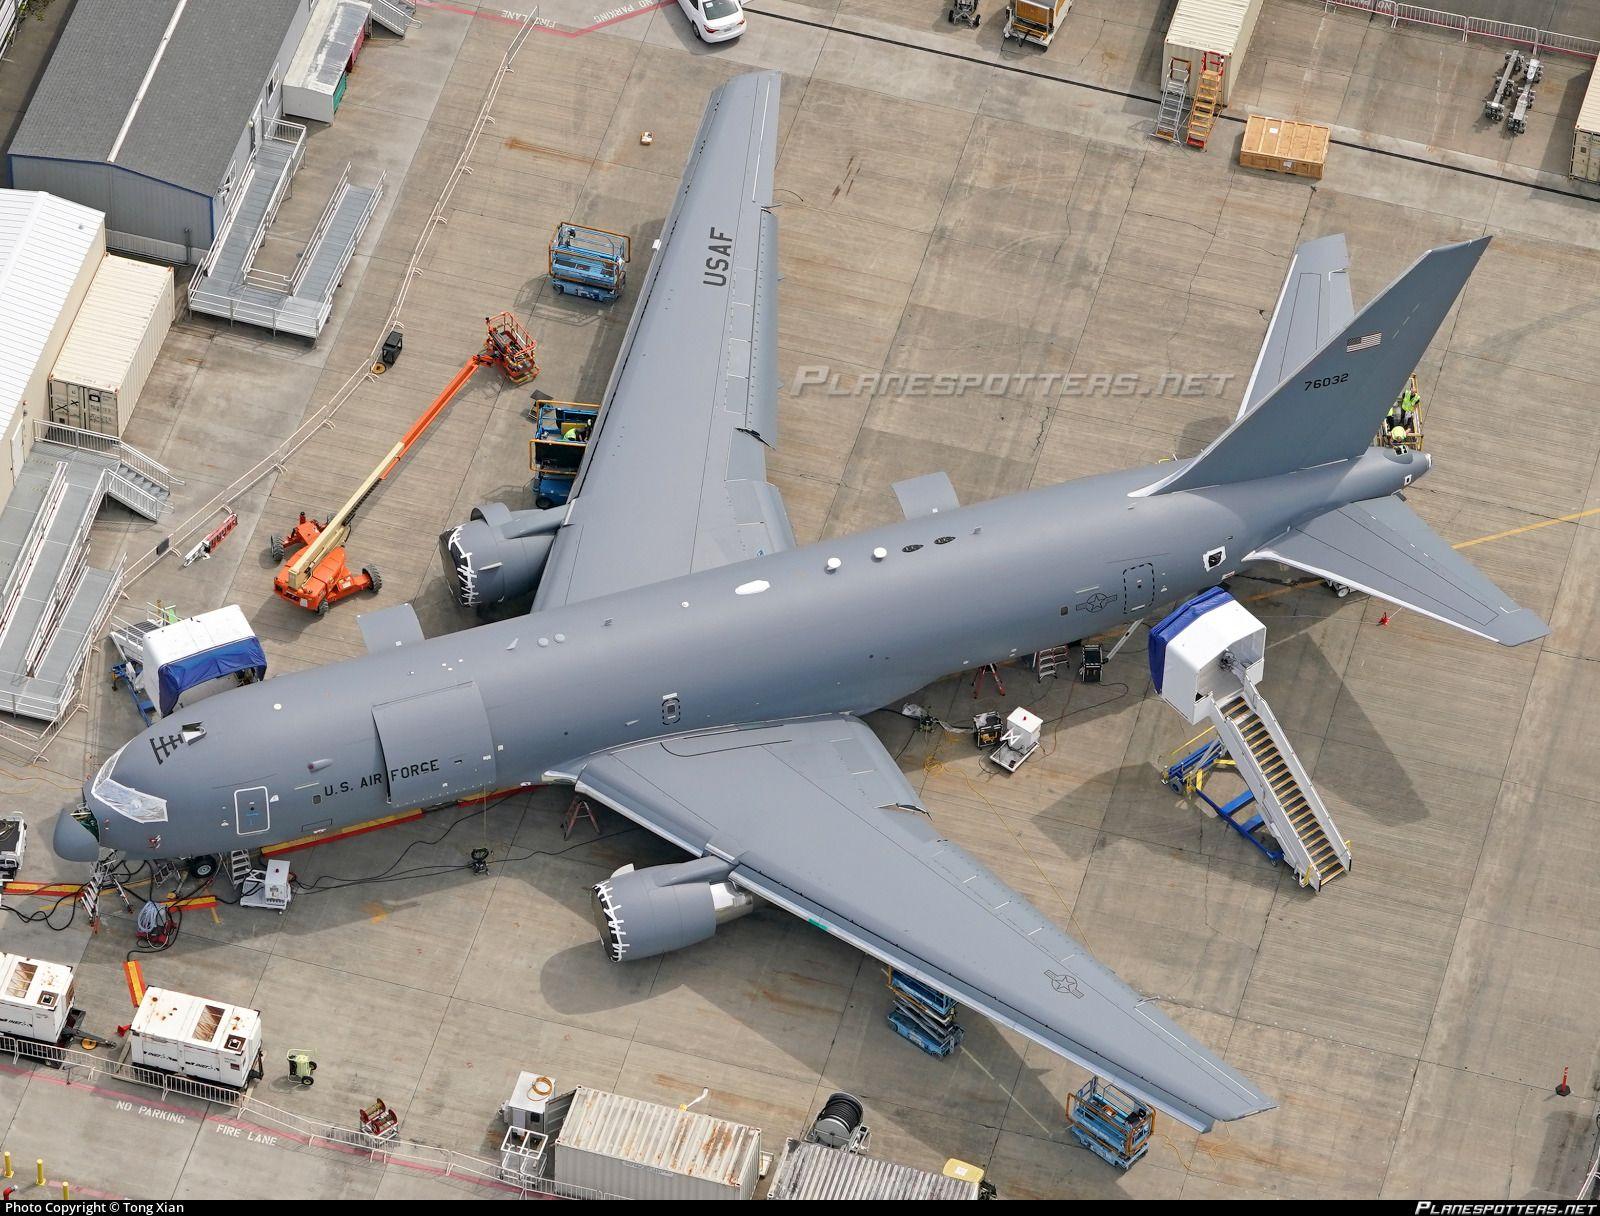 Airline United States Air Force (USAF) Registration 17